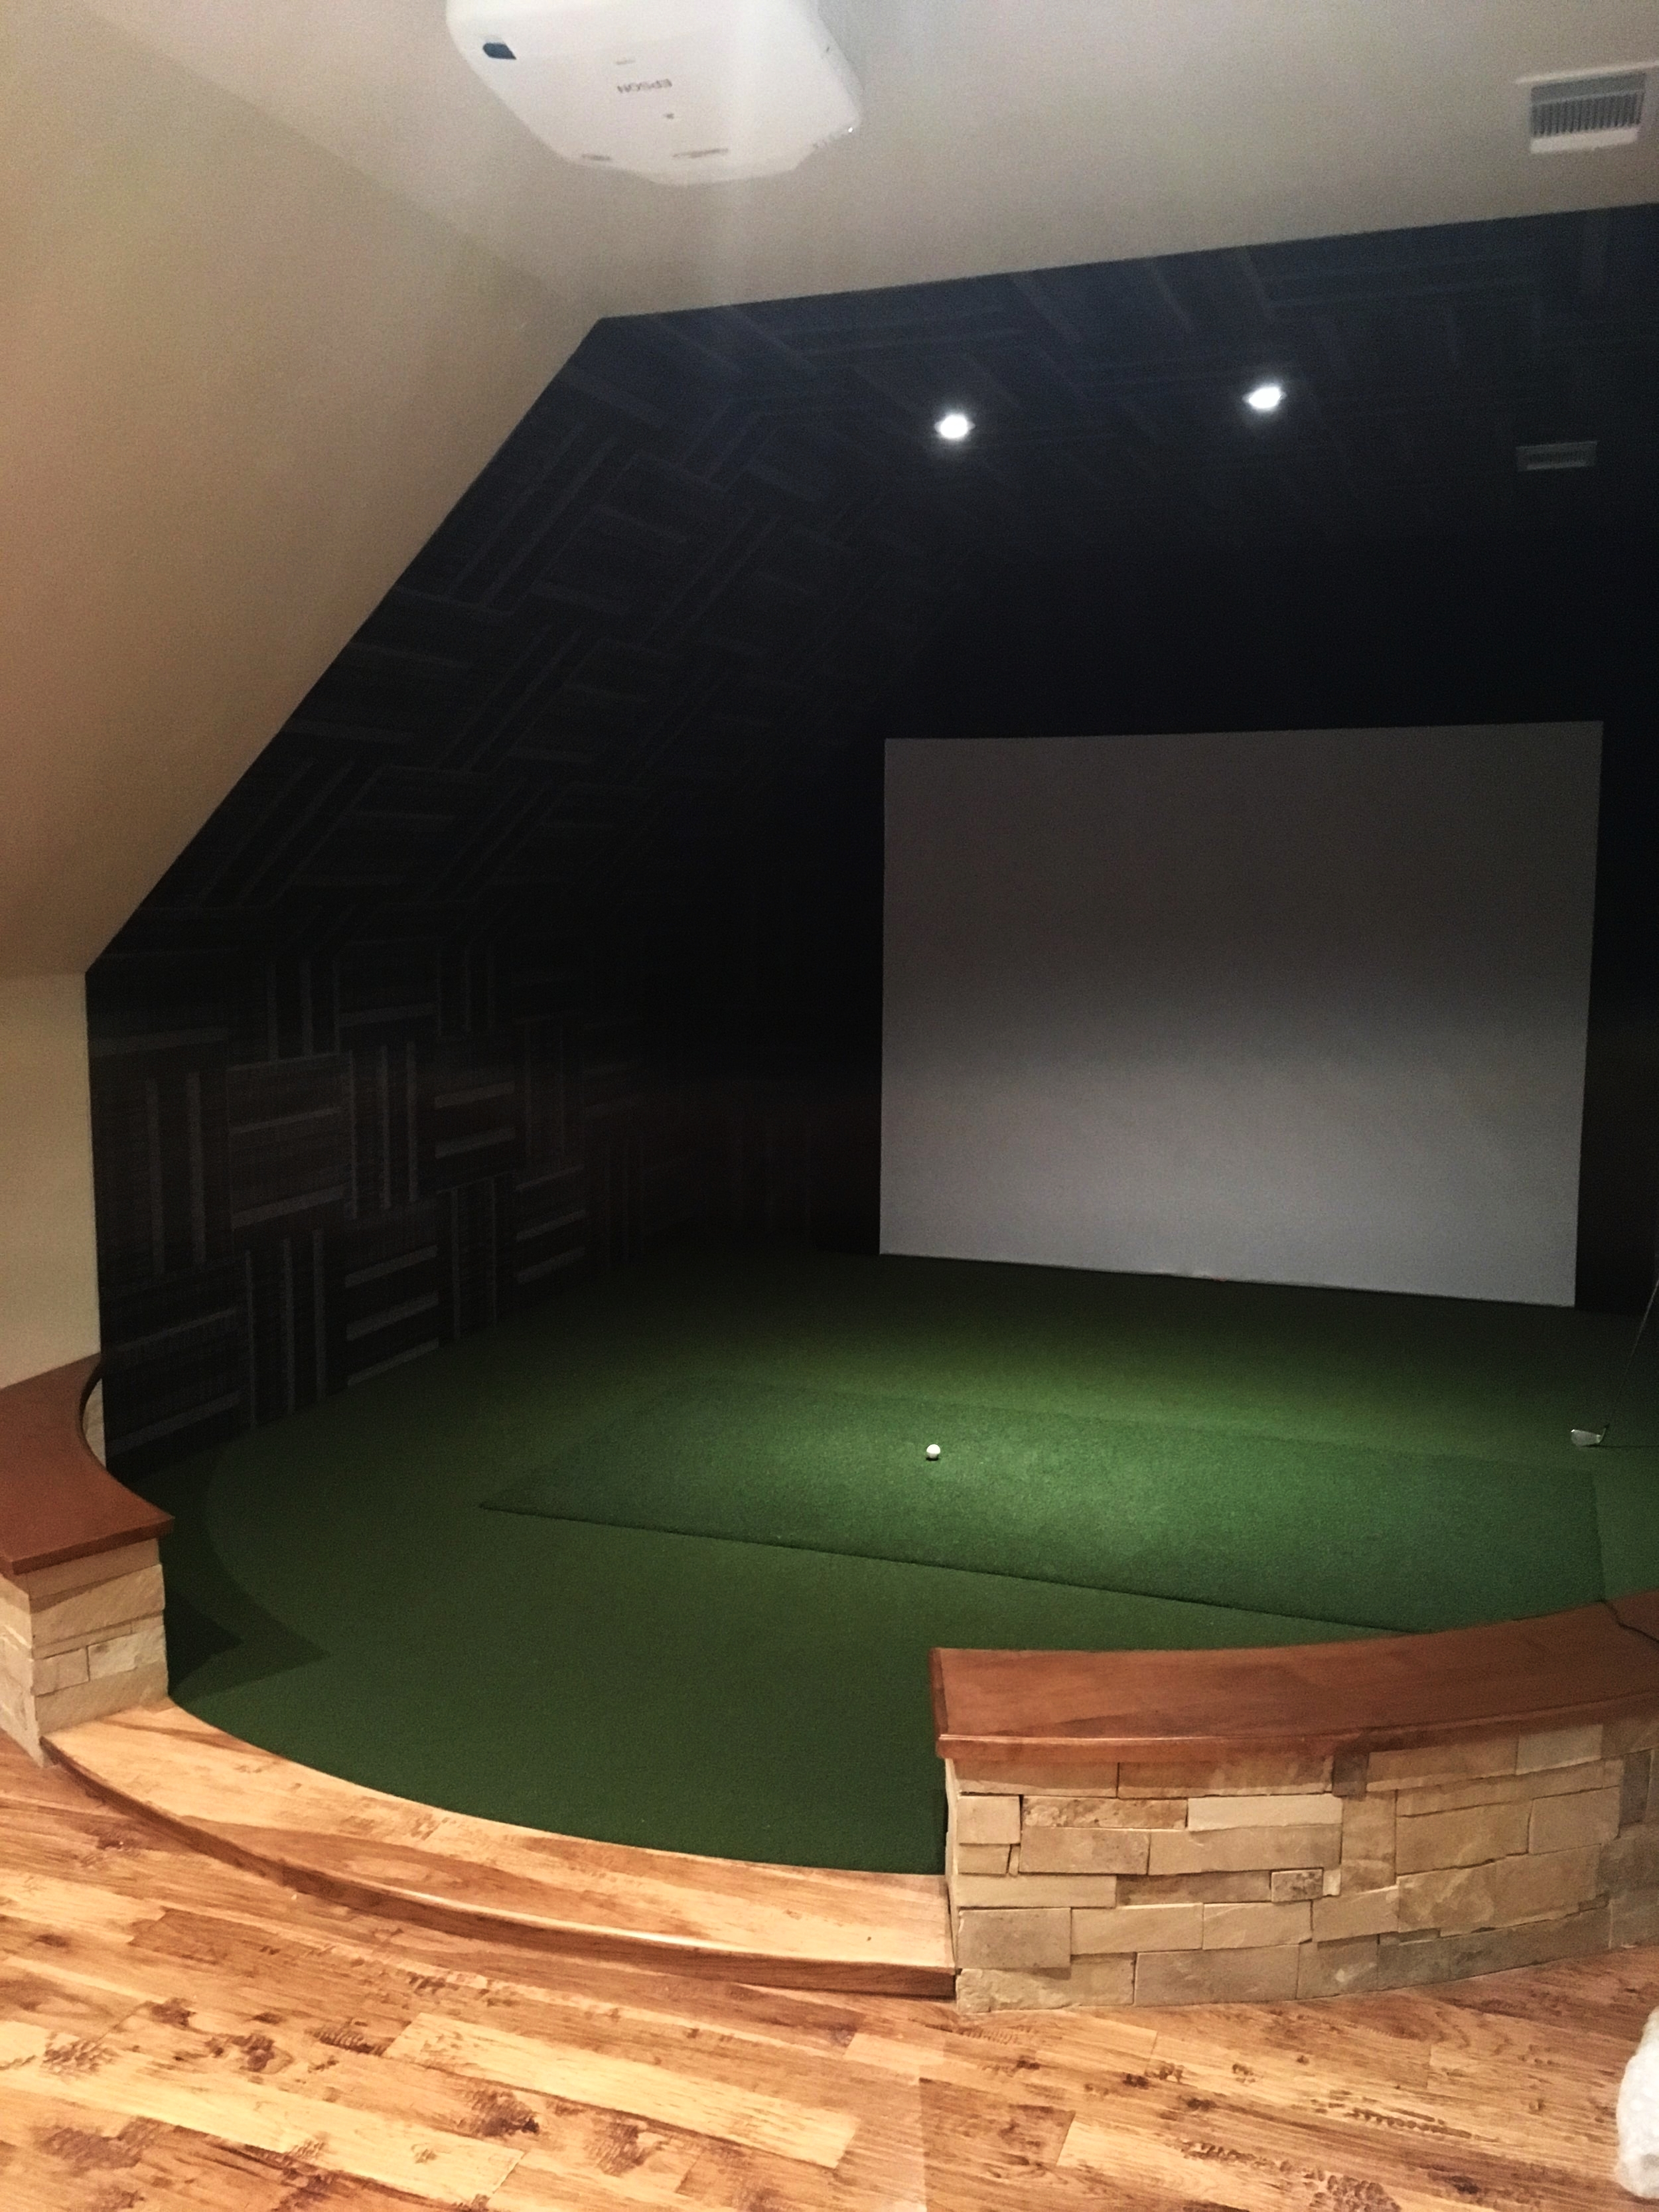 Completed golf simulator